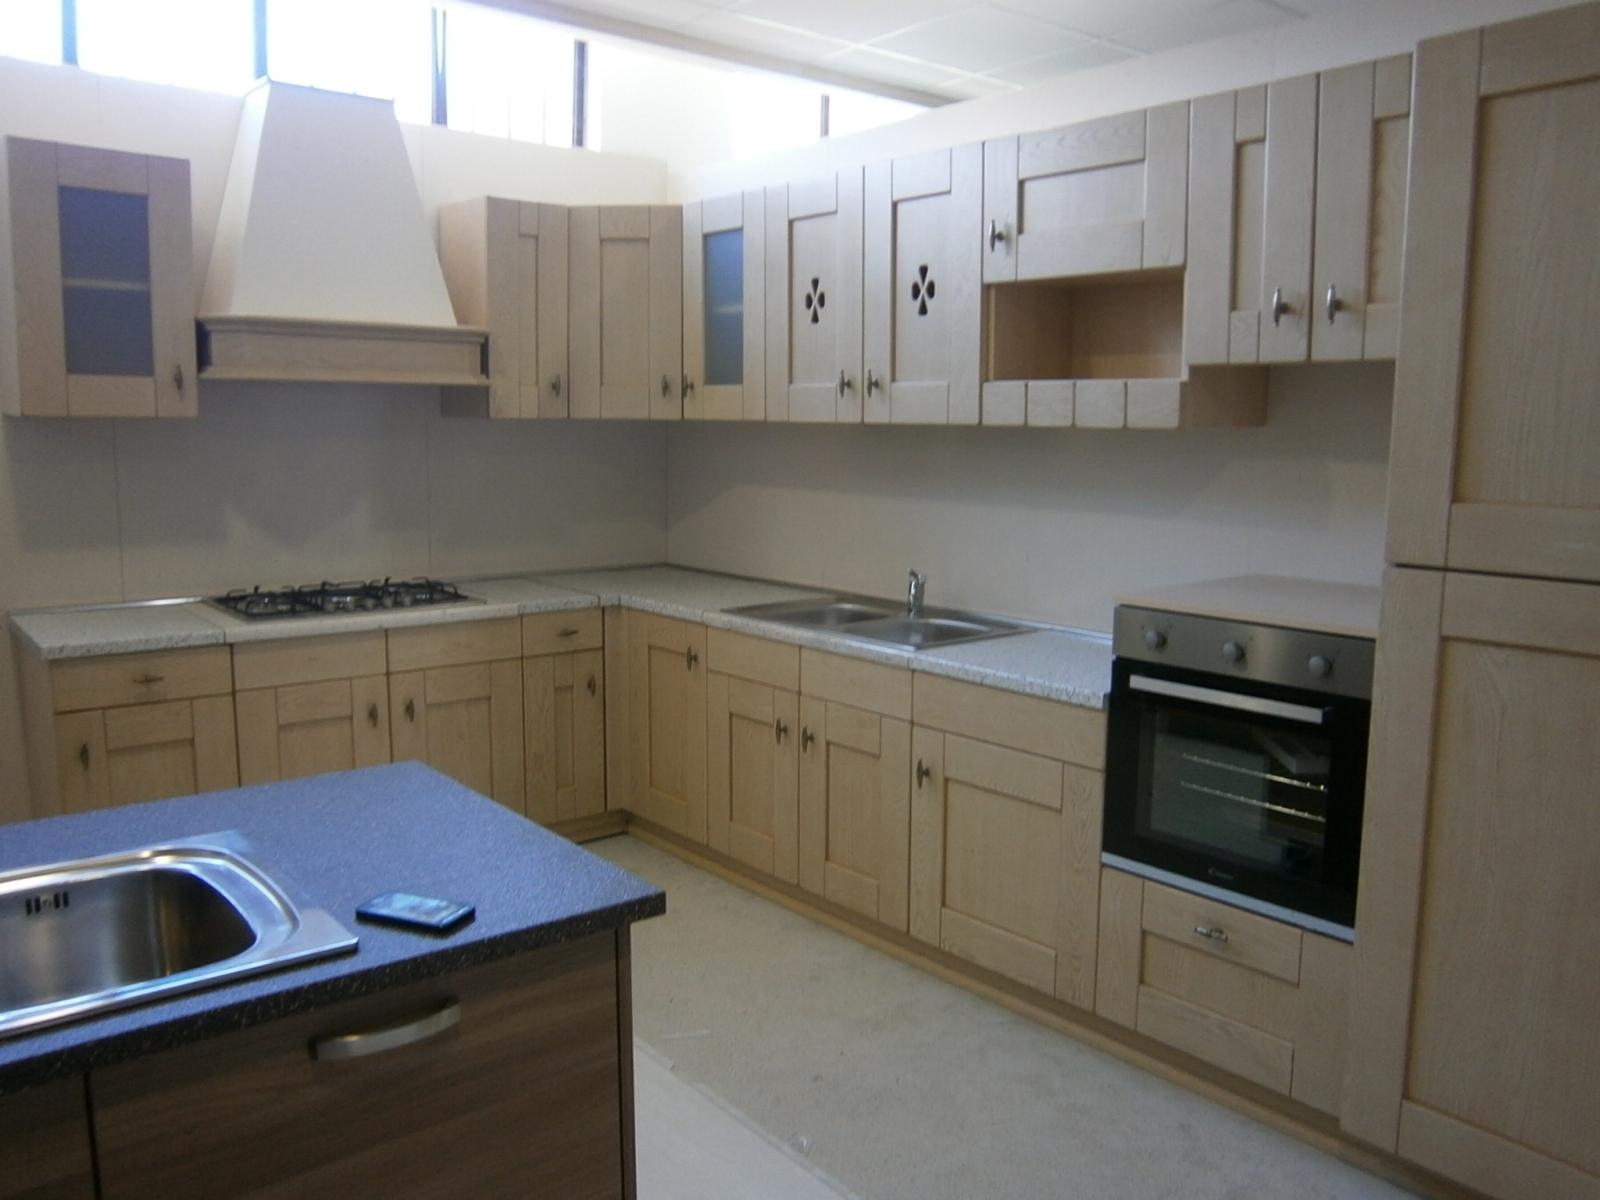 Cucina Arrex 1 Letizia Decap Scontato Del 64 Cucine - Arrex Cucine ...